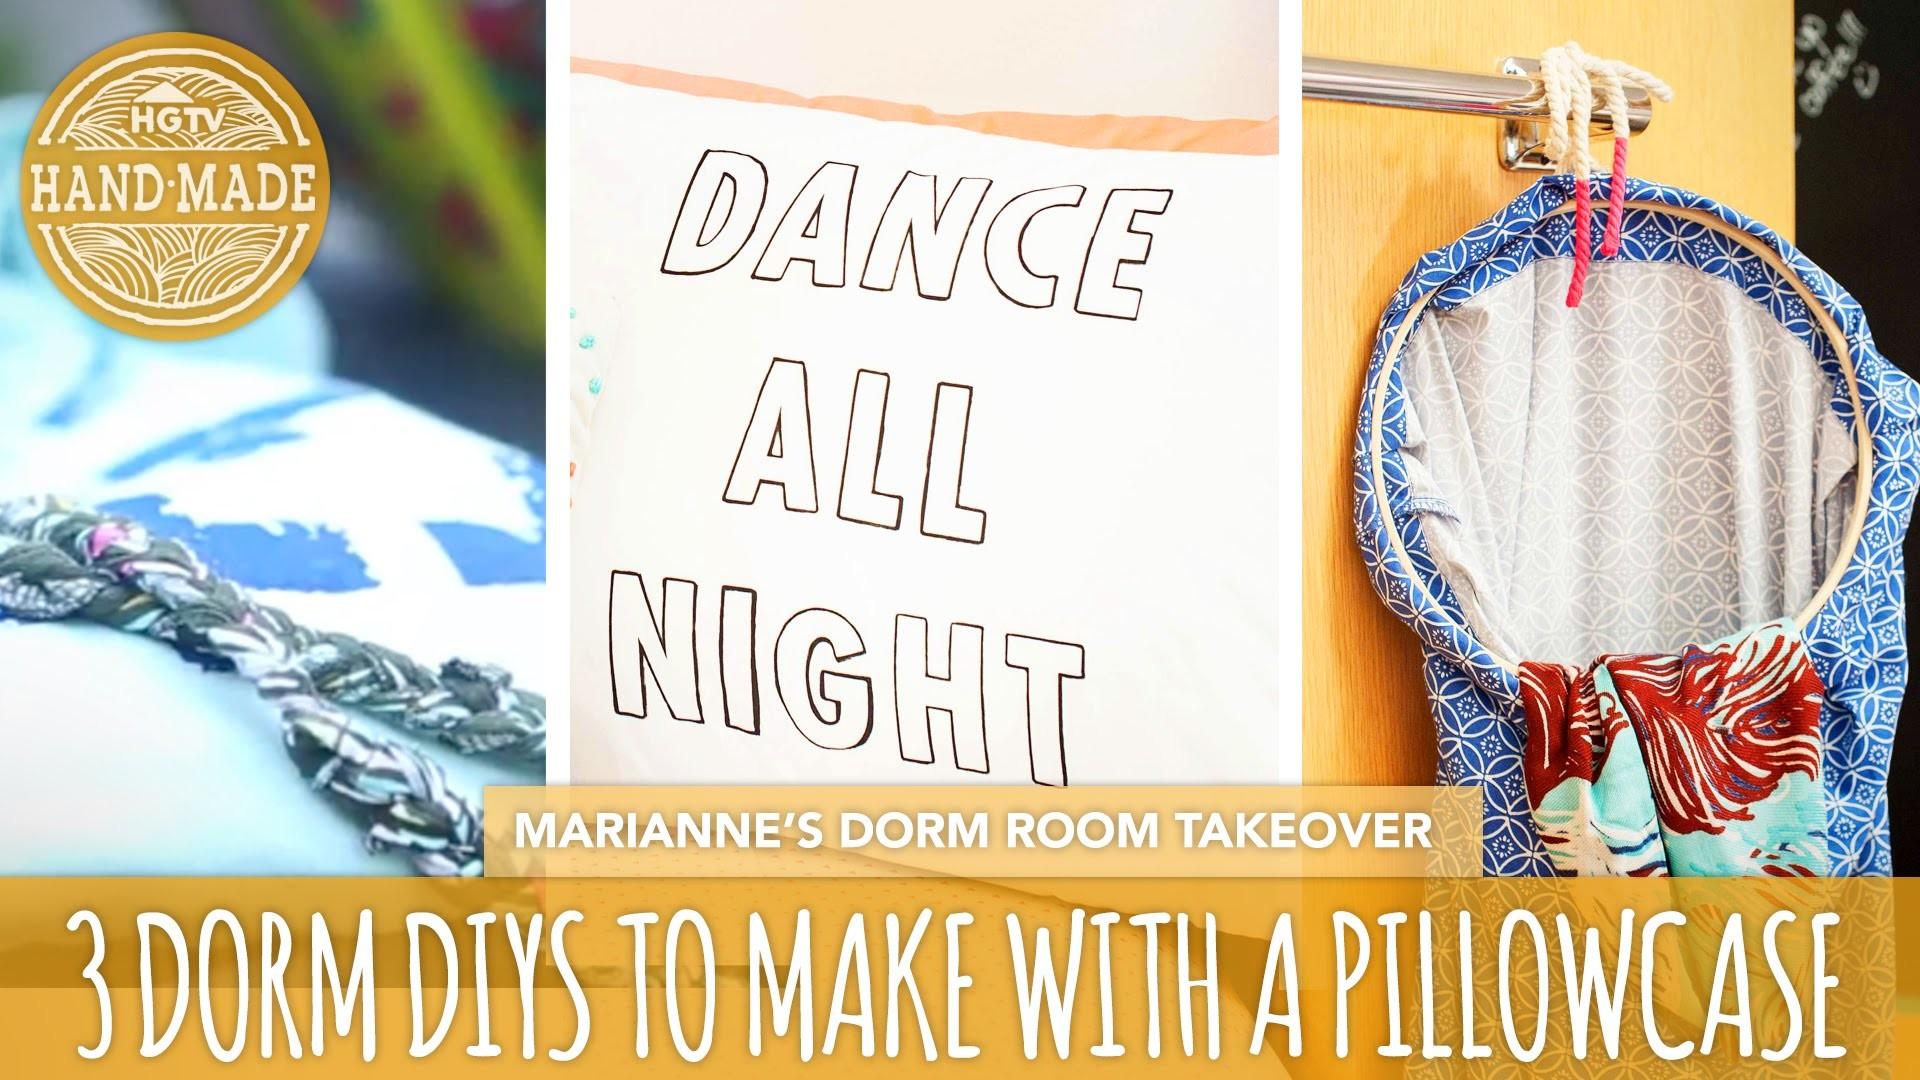 3 Back To School DIYs You Can Make With a Pillowcase - HGTV Handmade